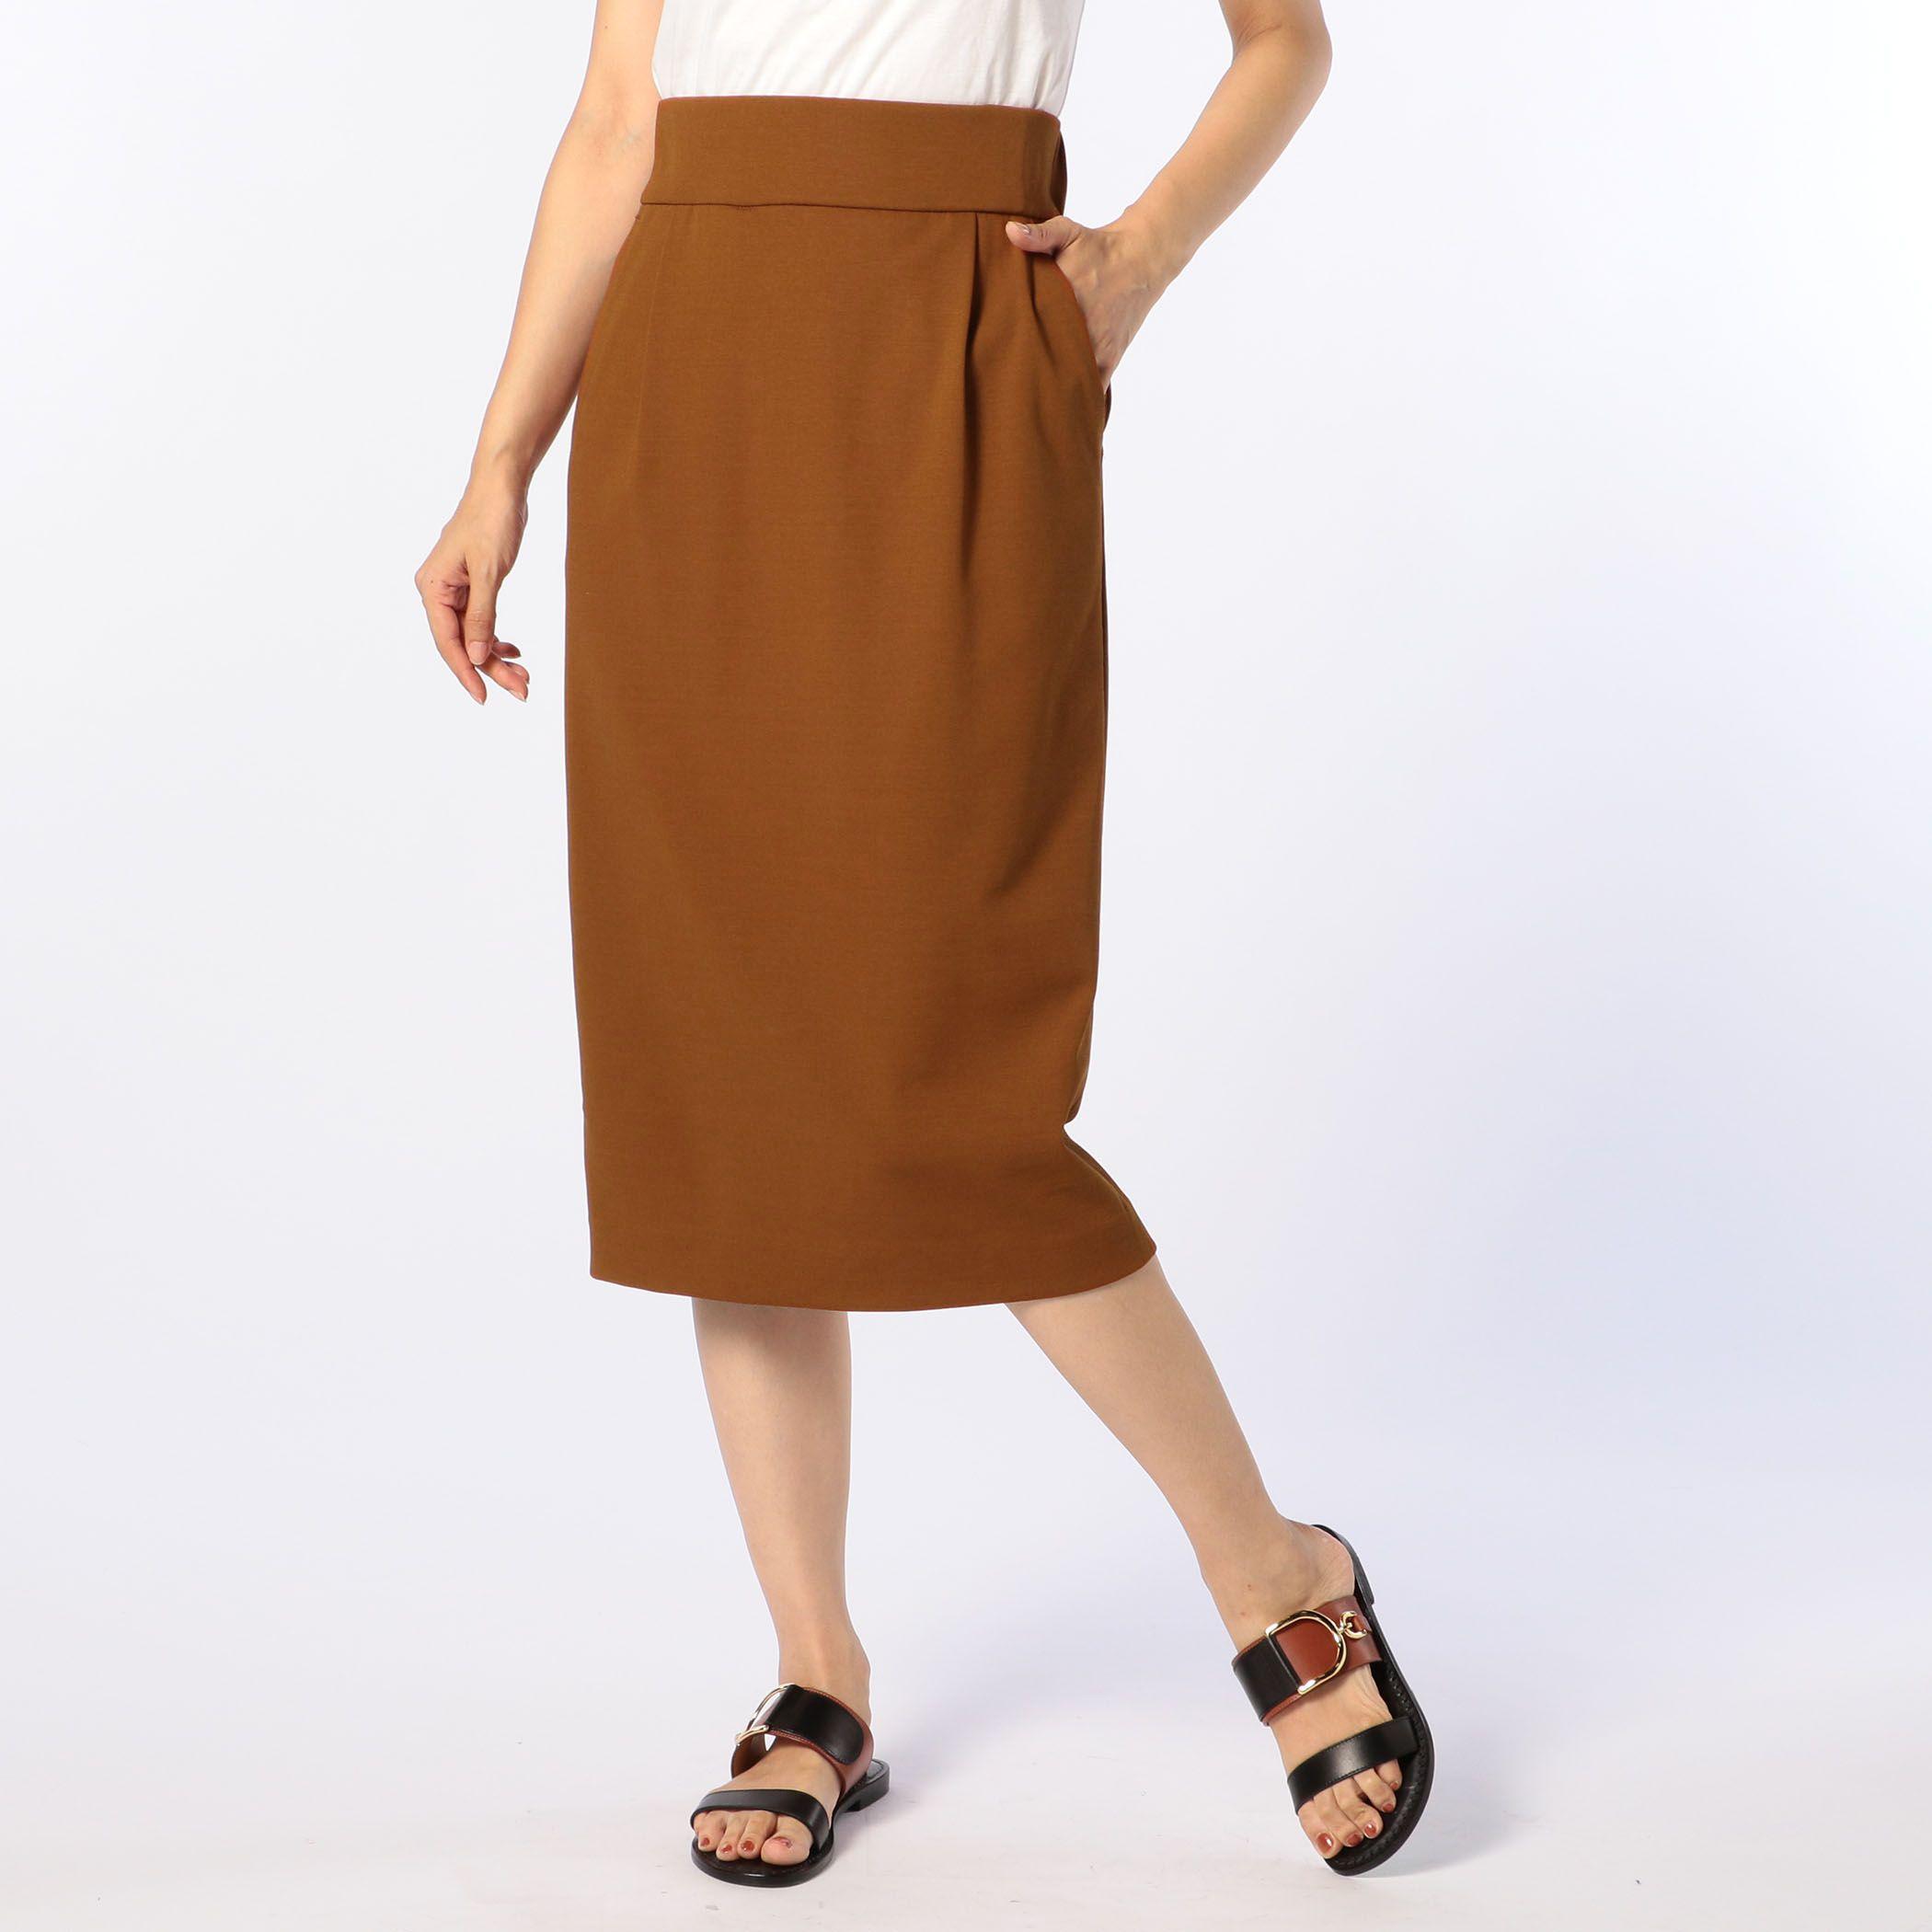 NOLLEY'Sノーリーズ/ポンチタックタイトスカート